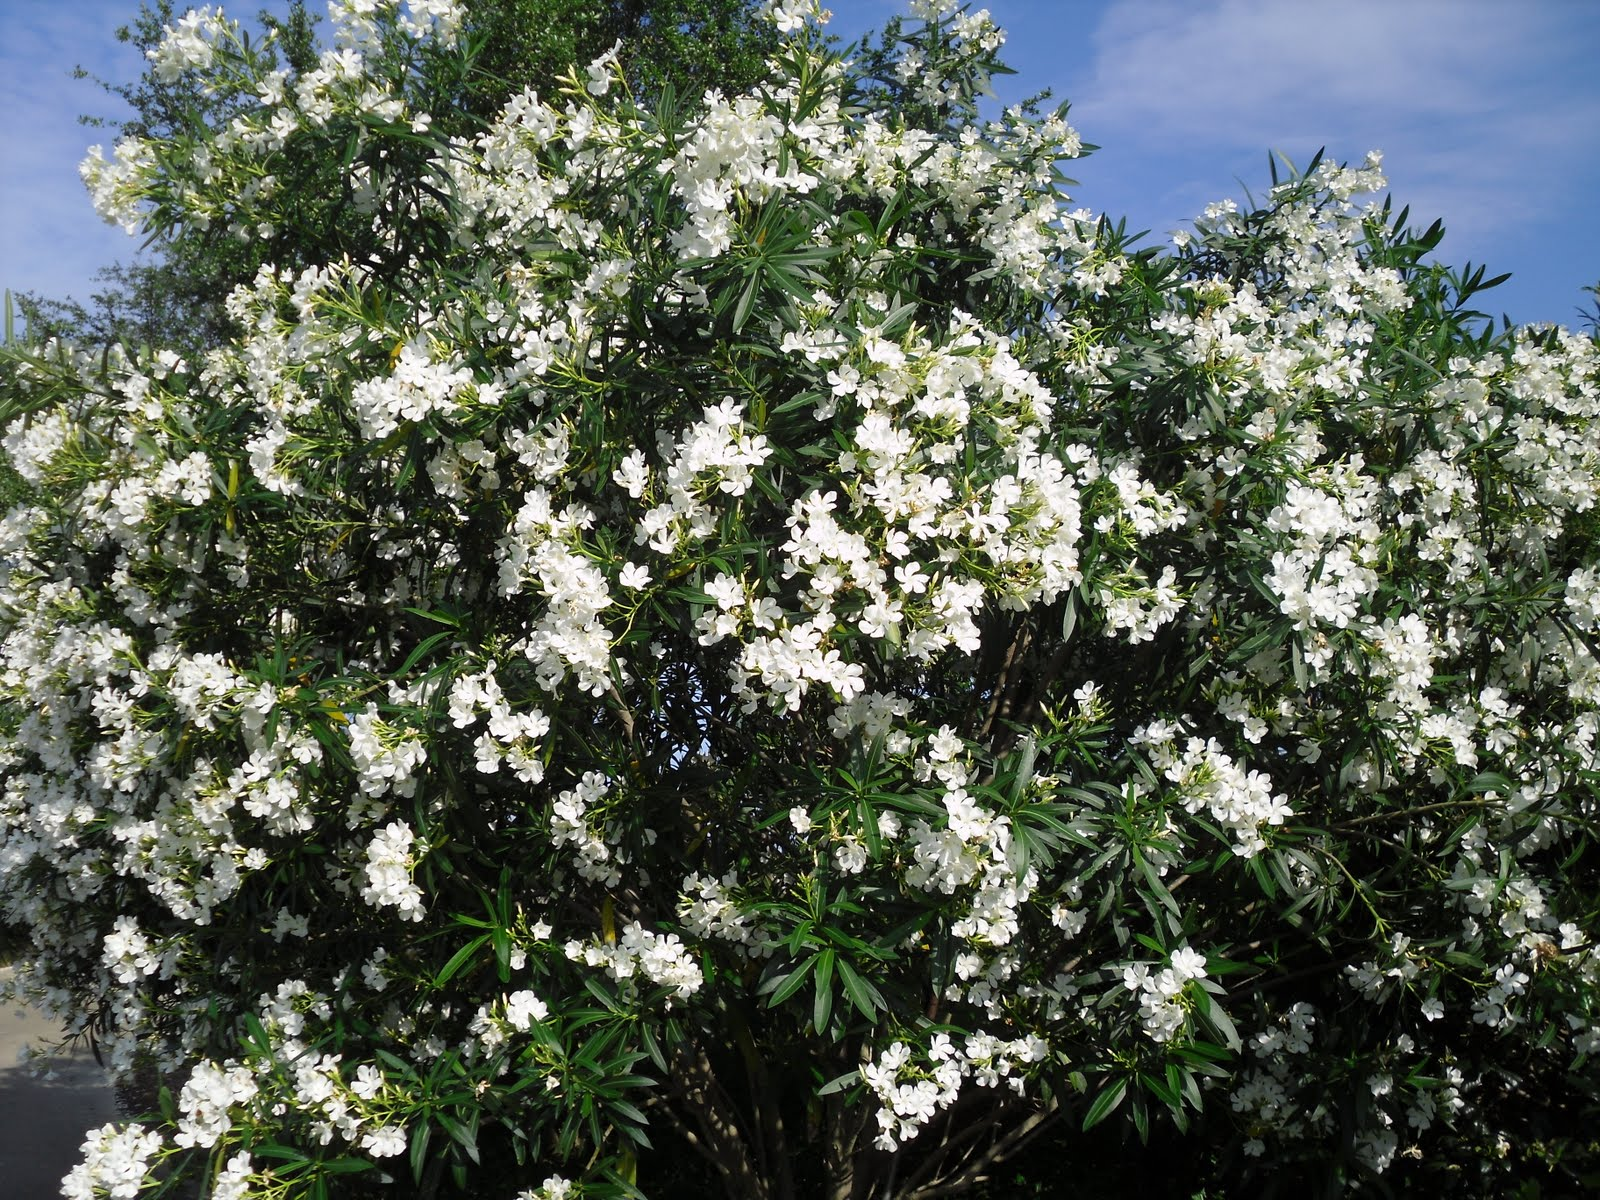 Jupiter Real Estate And Lifestyle Oleanders In Bloom